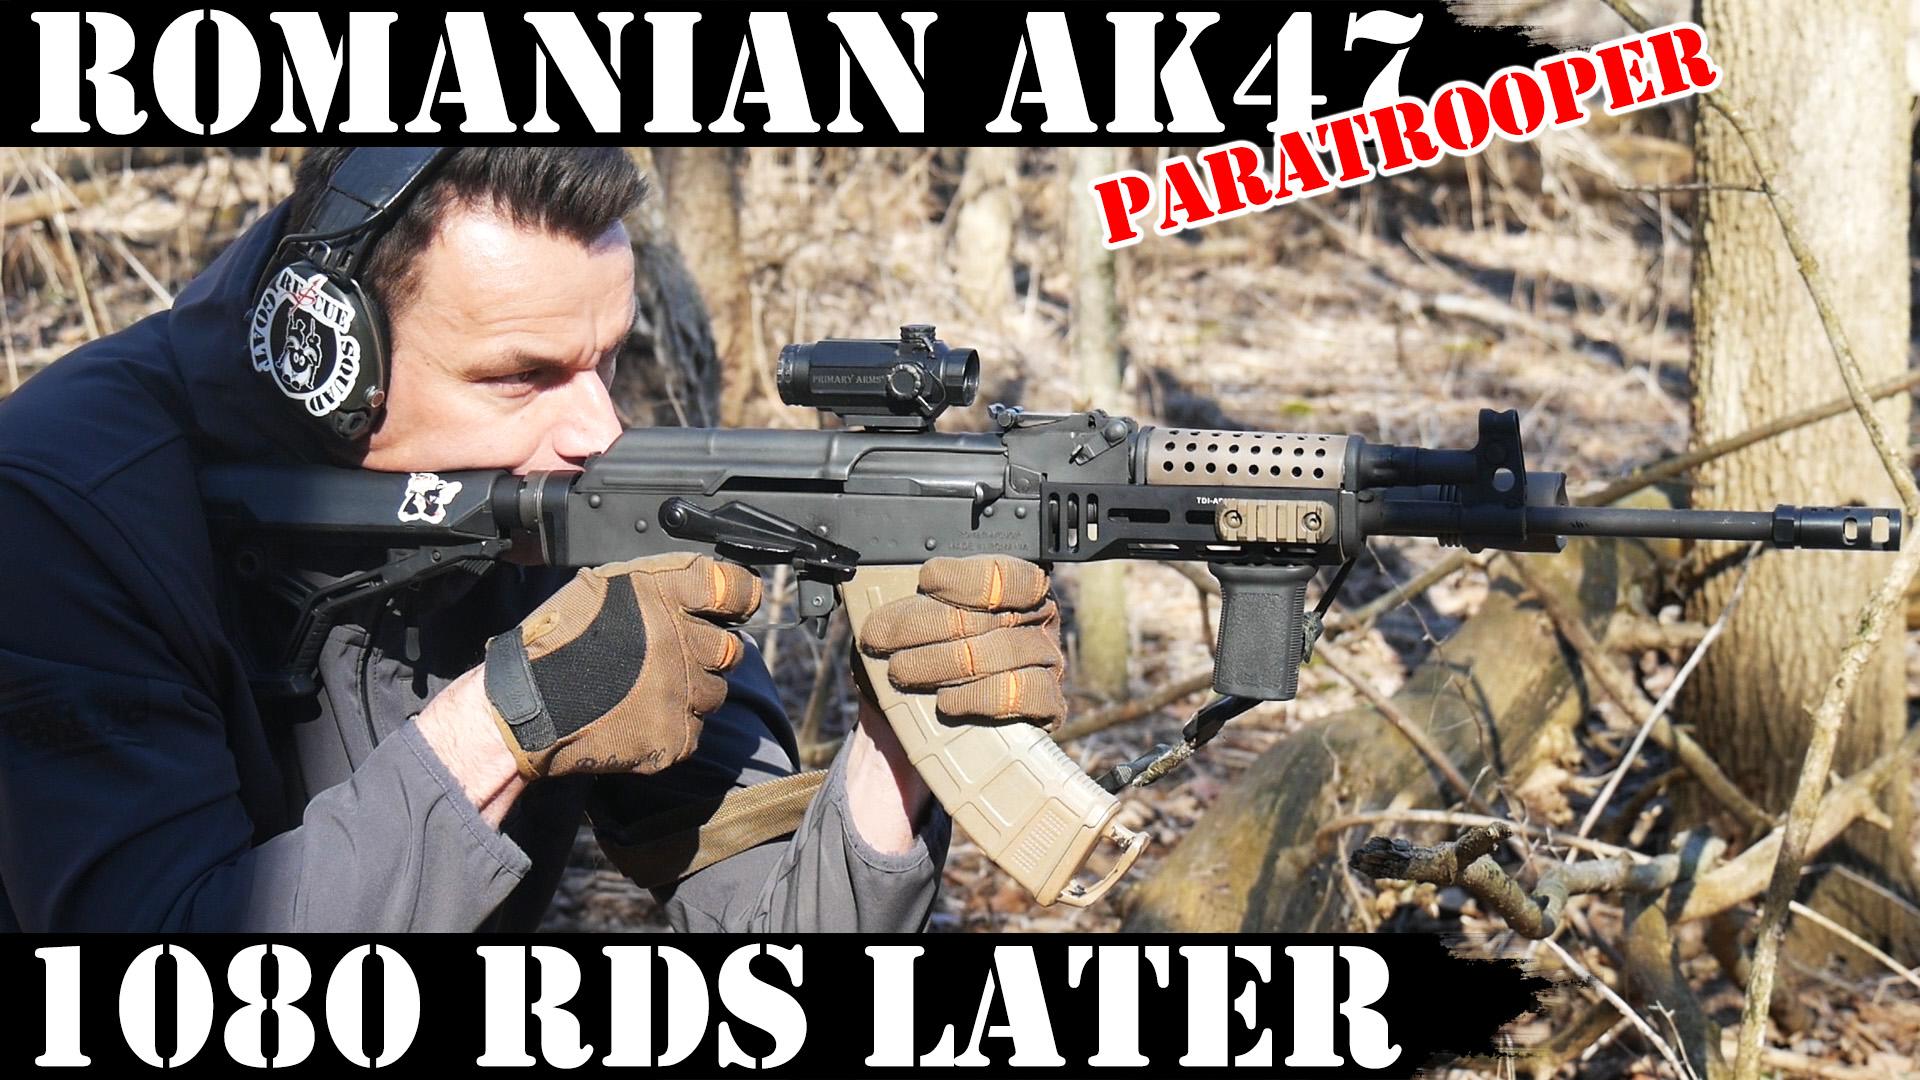 Romanian Paratrooper AK47: 1080 Rounds Later! - AK Operators